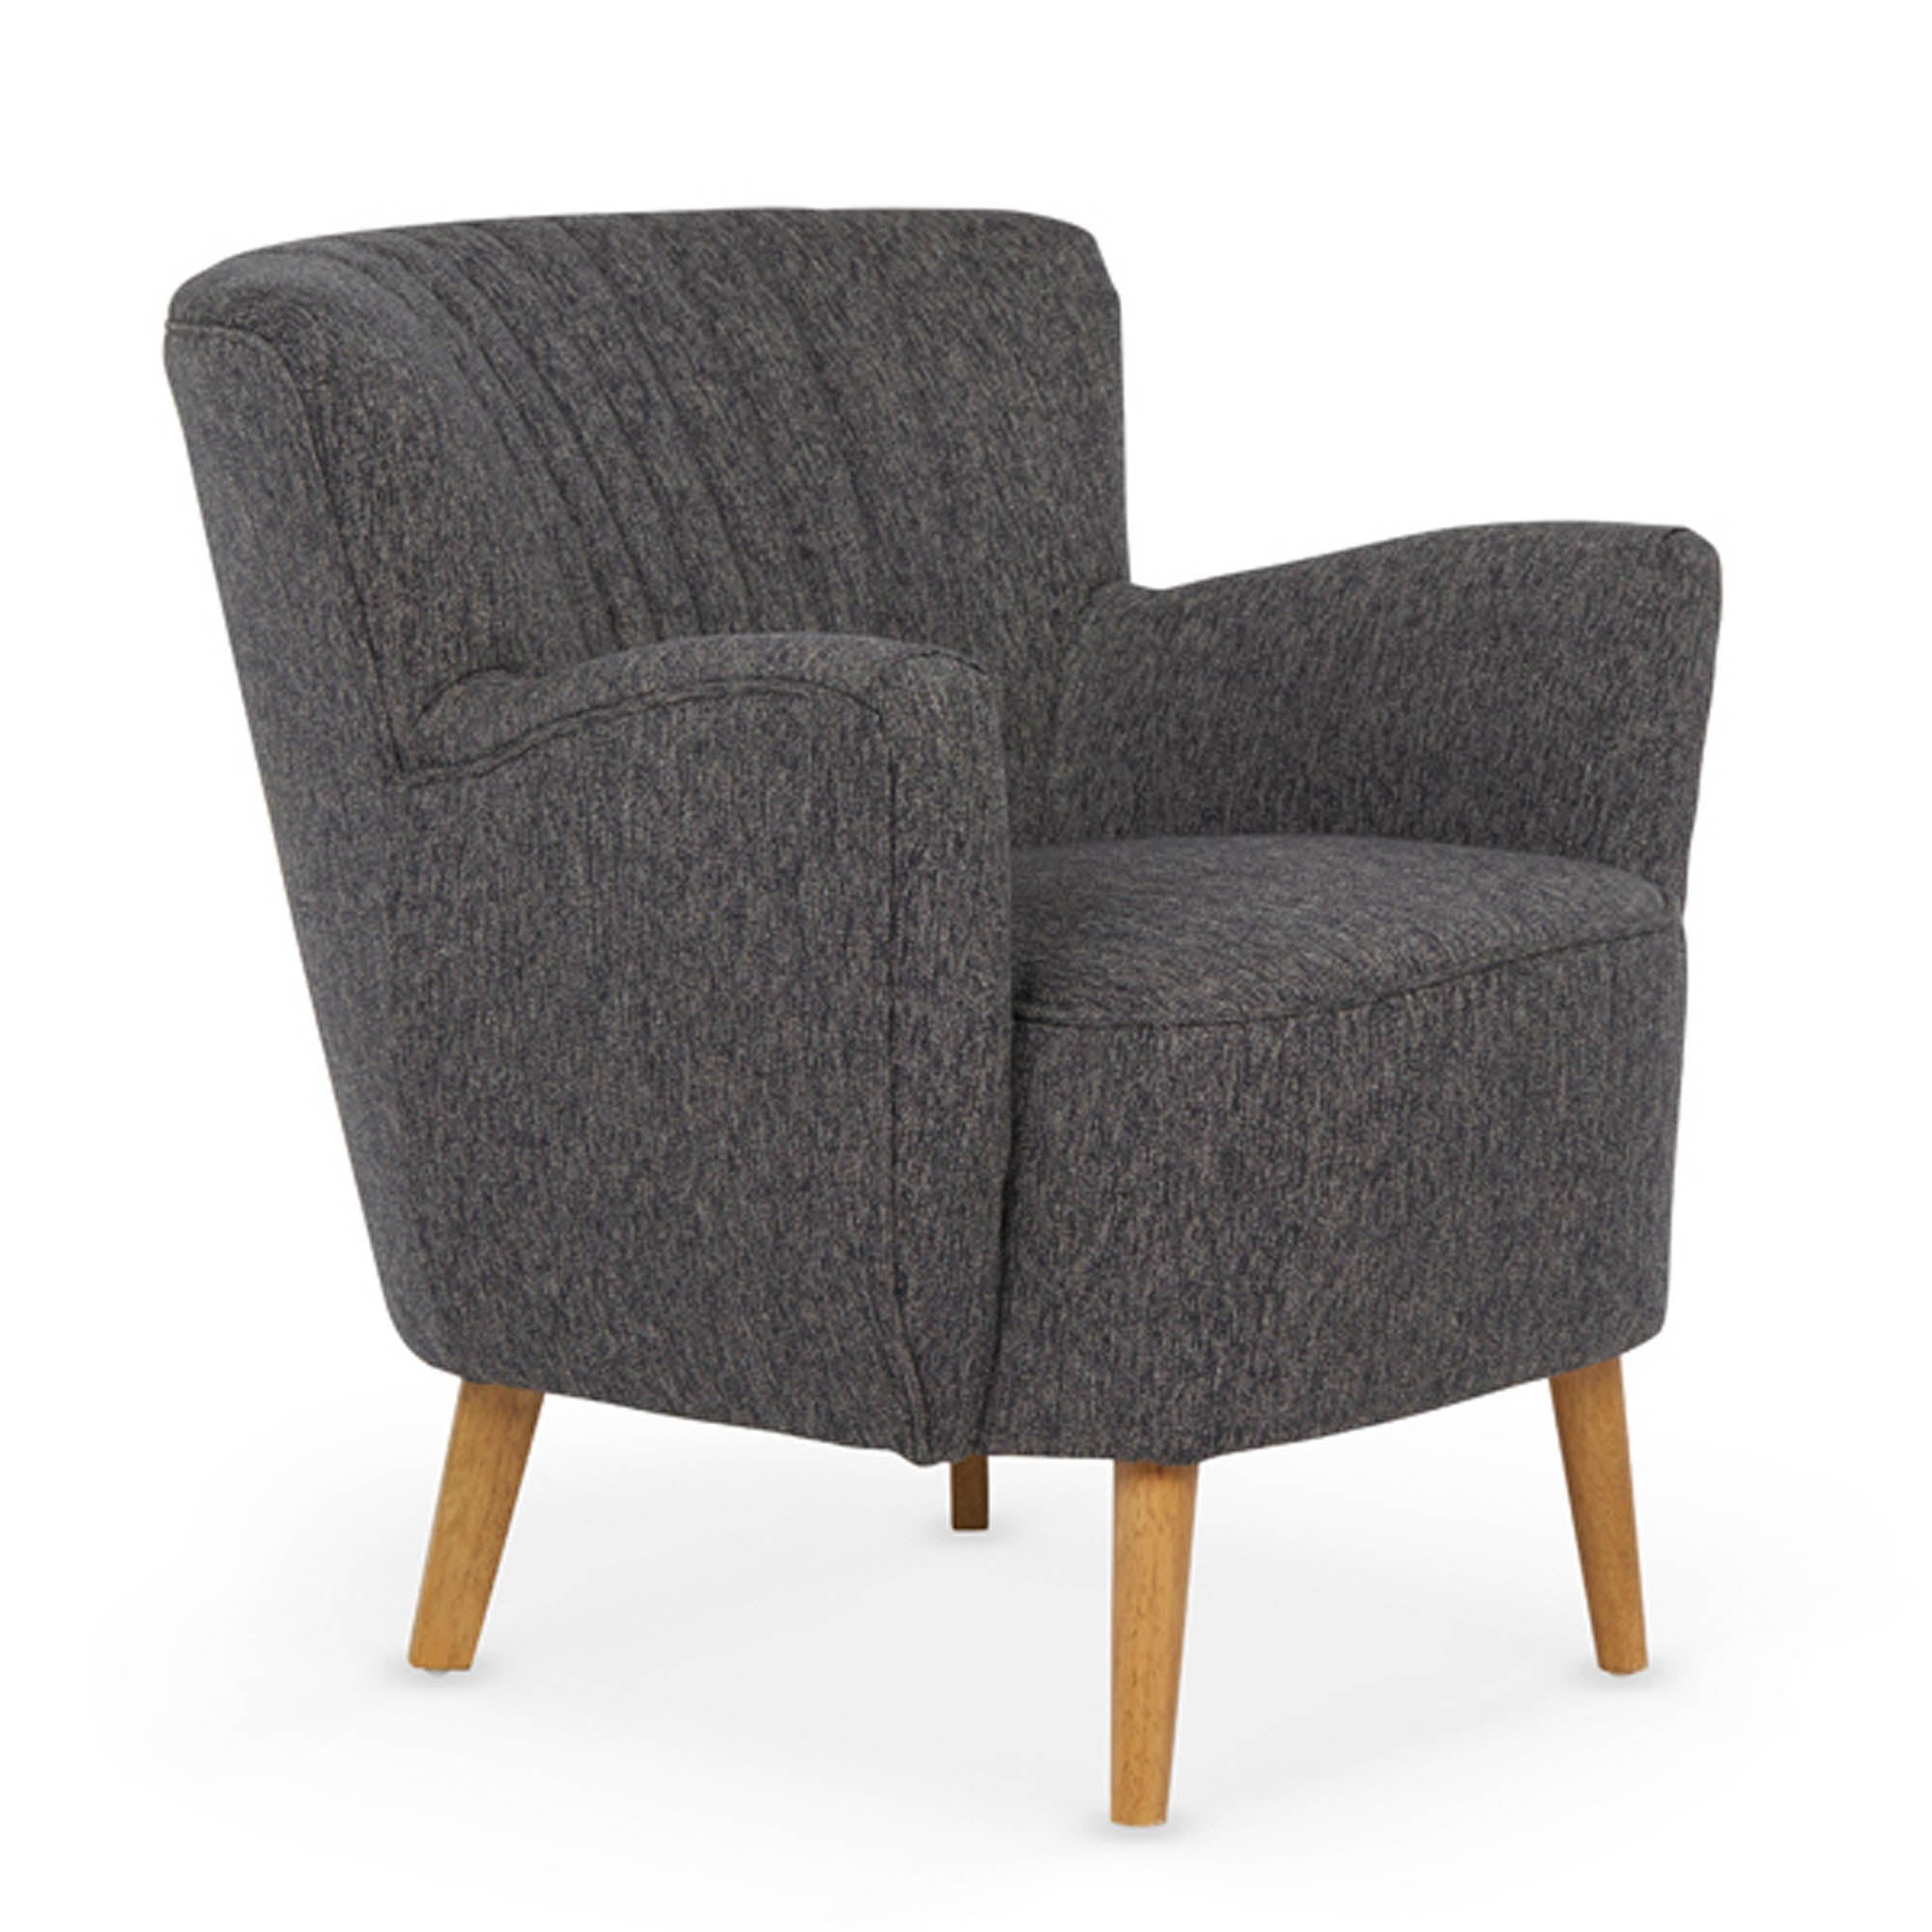 Alloa Charcoal Tub Chair Charcoal